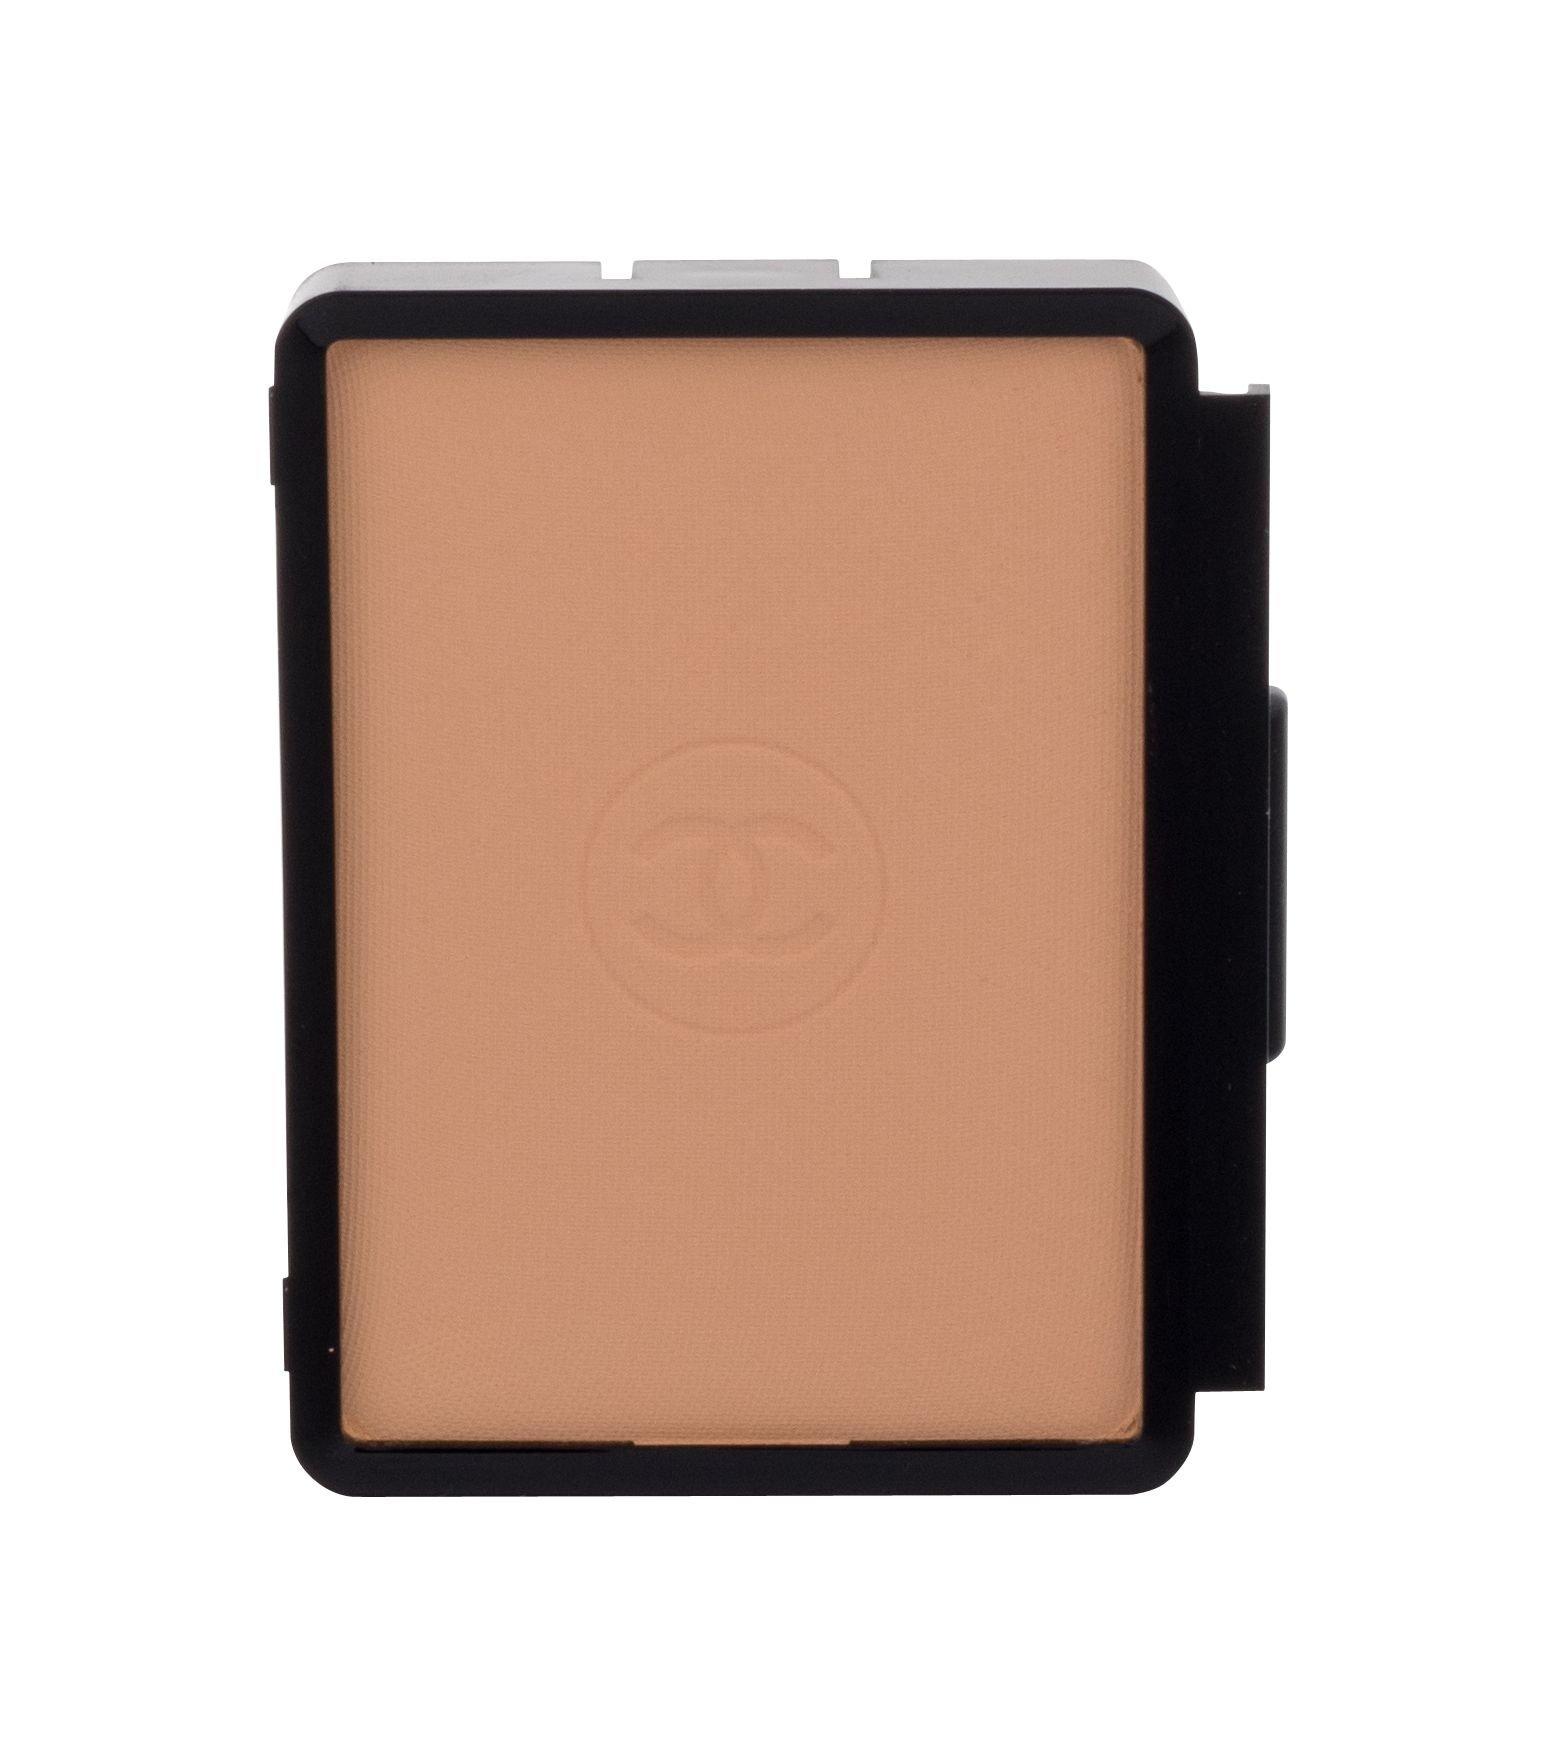 Chanel Le Teint Ultra Makeup 13ml 50 Beige Ultrawear Flawless Compact Foundation